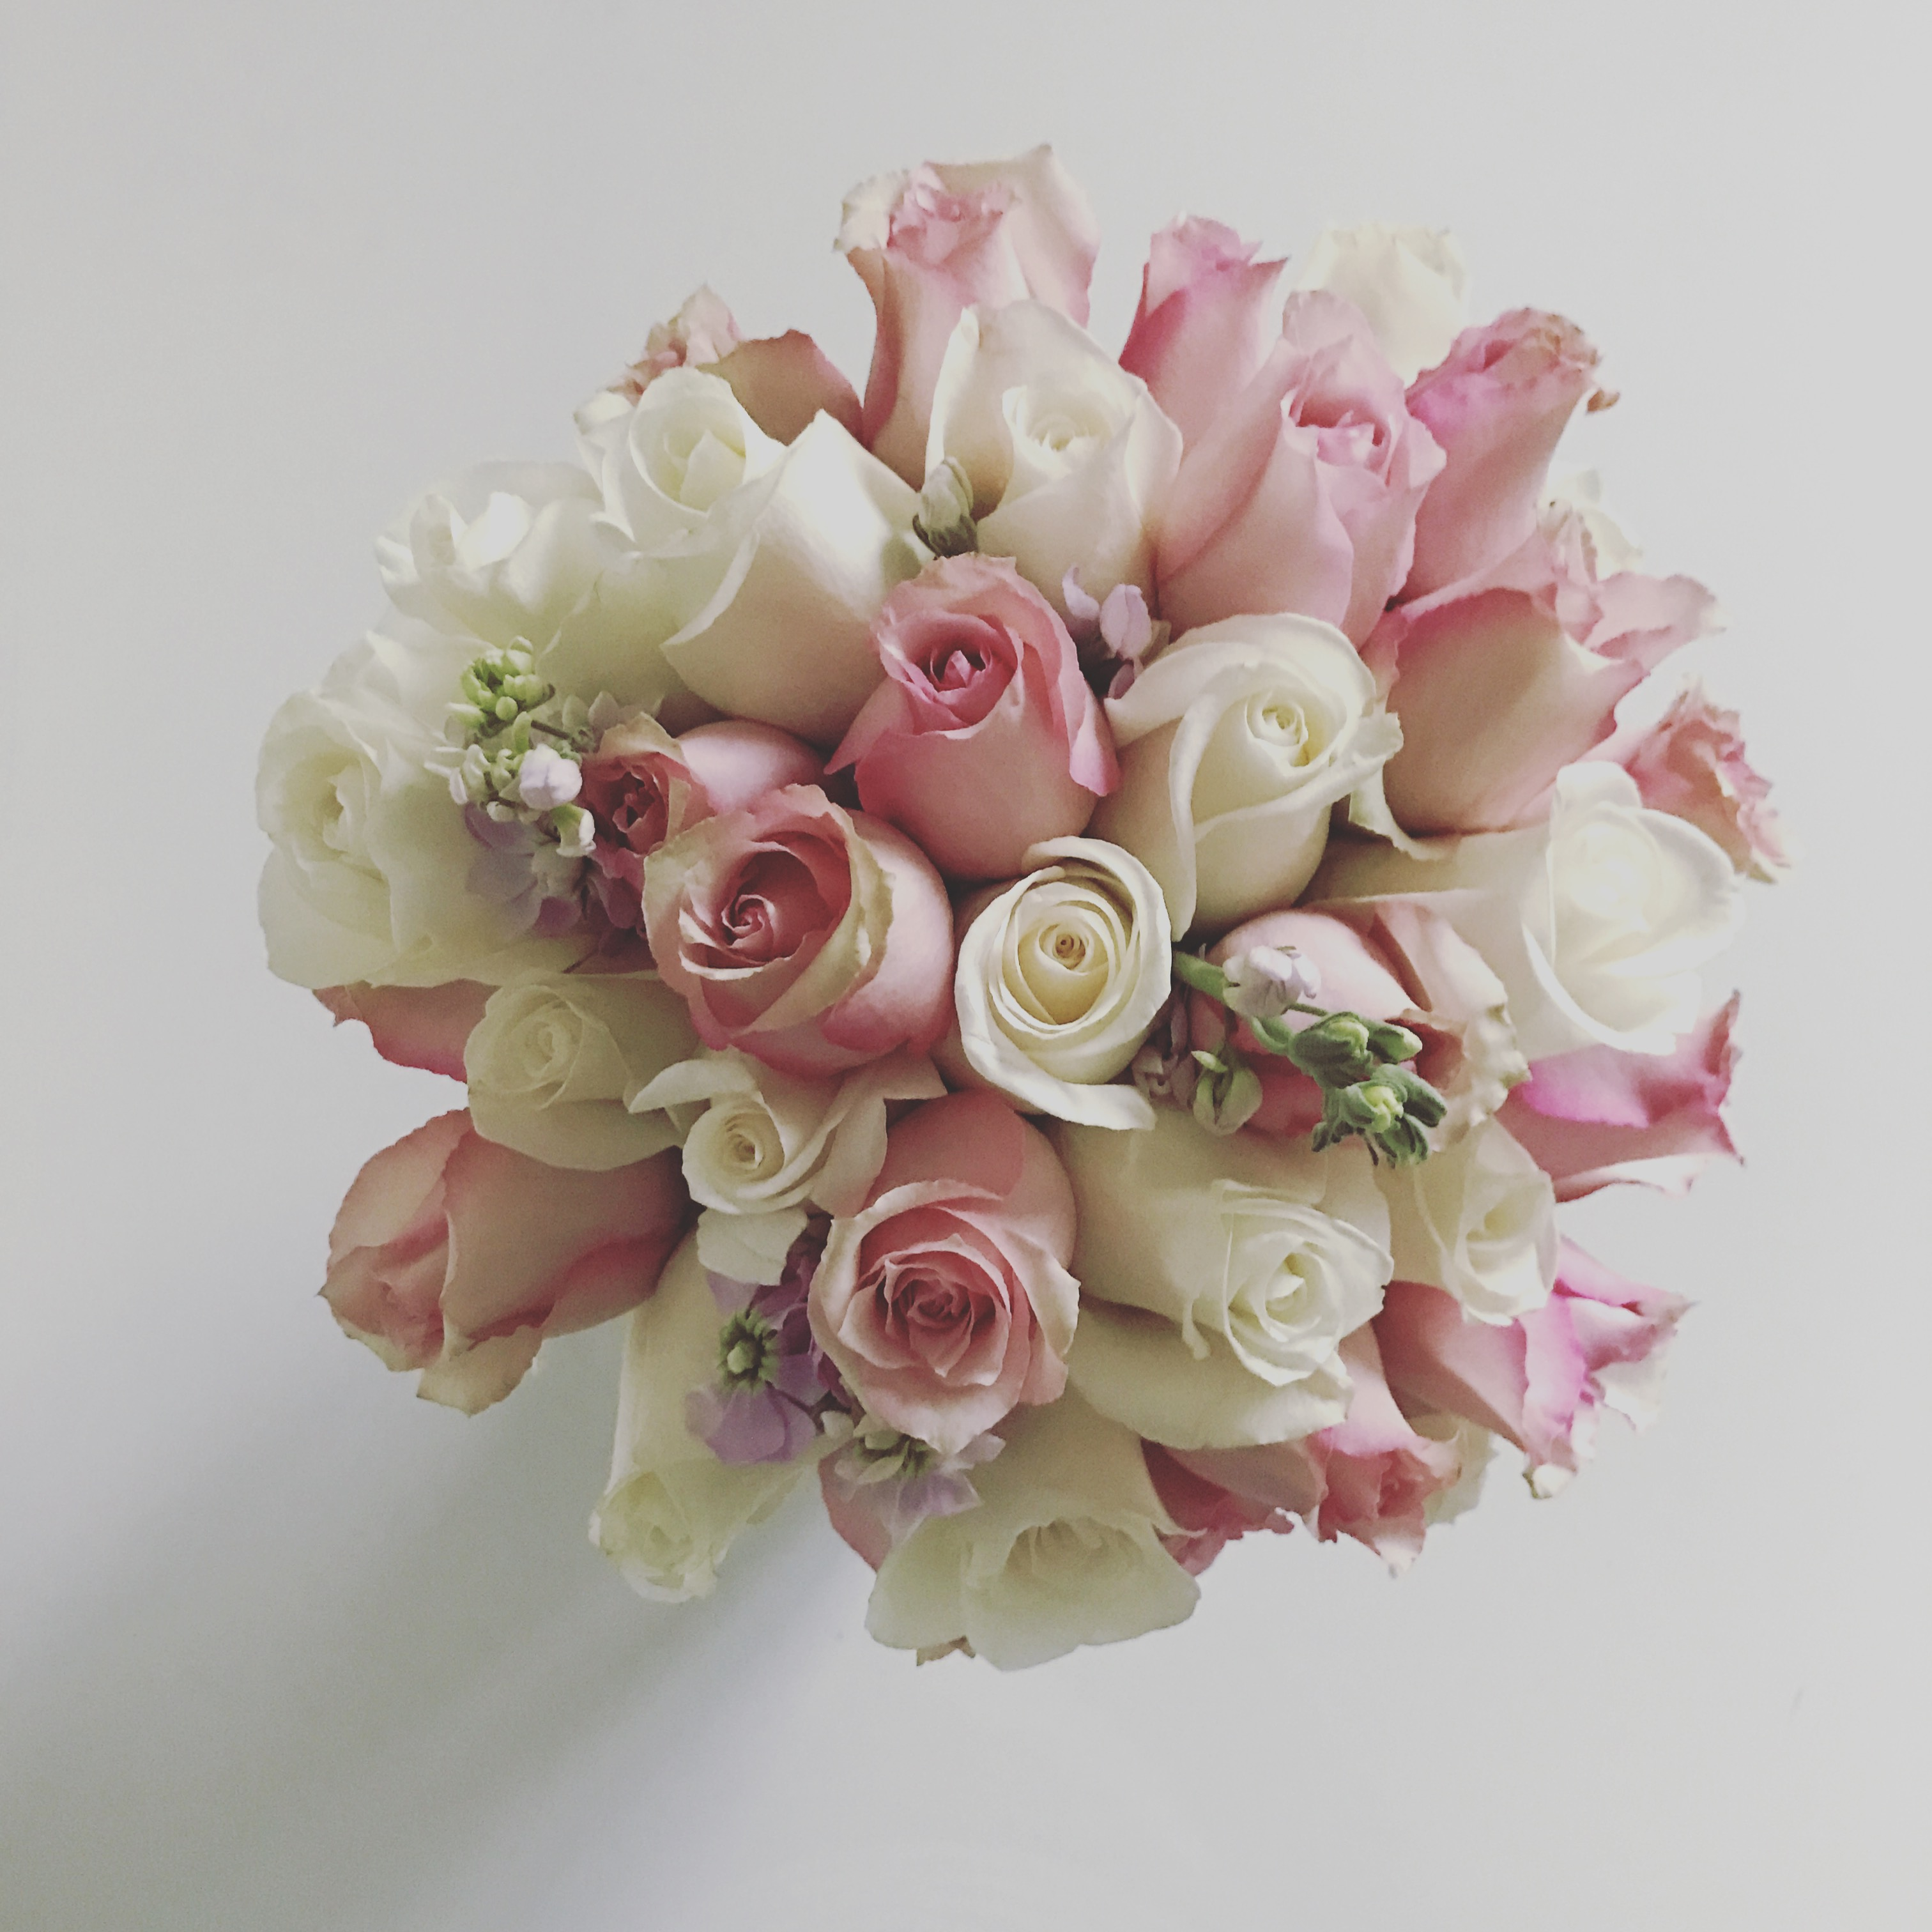 Soft pink, seasonal bridal bouquet